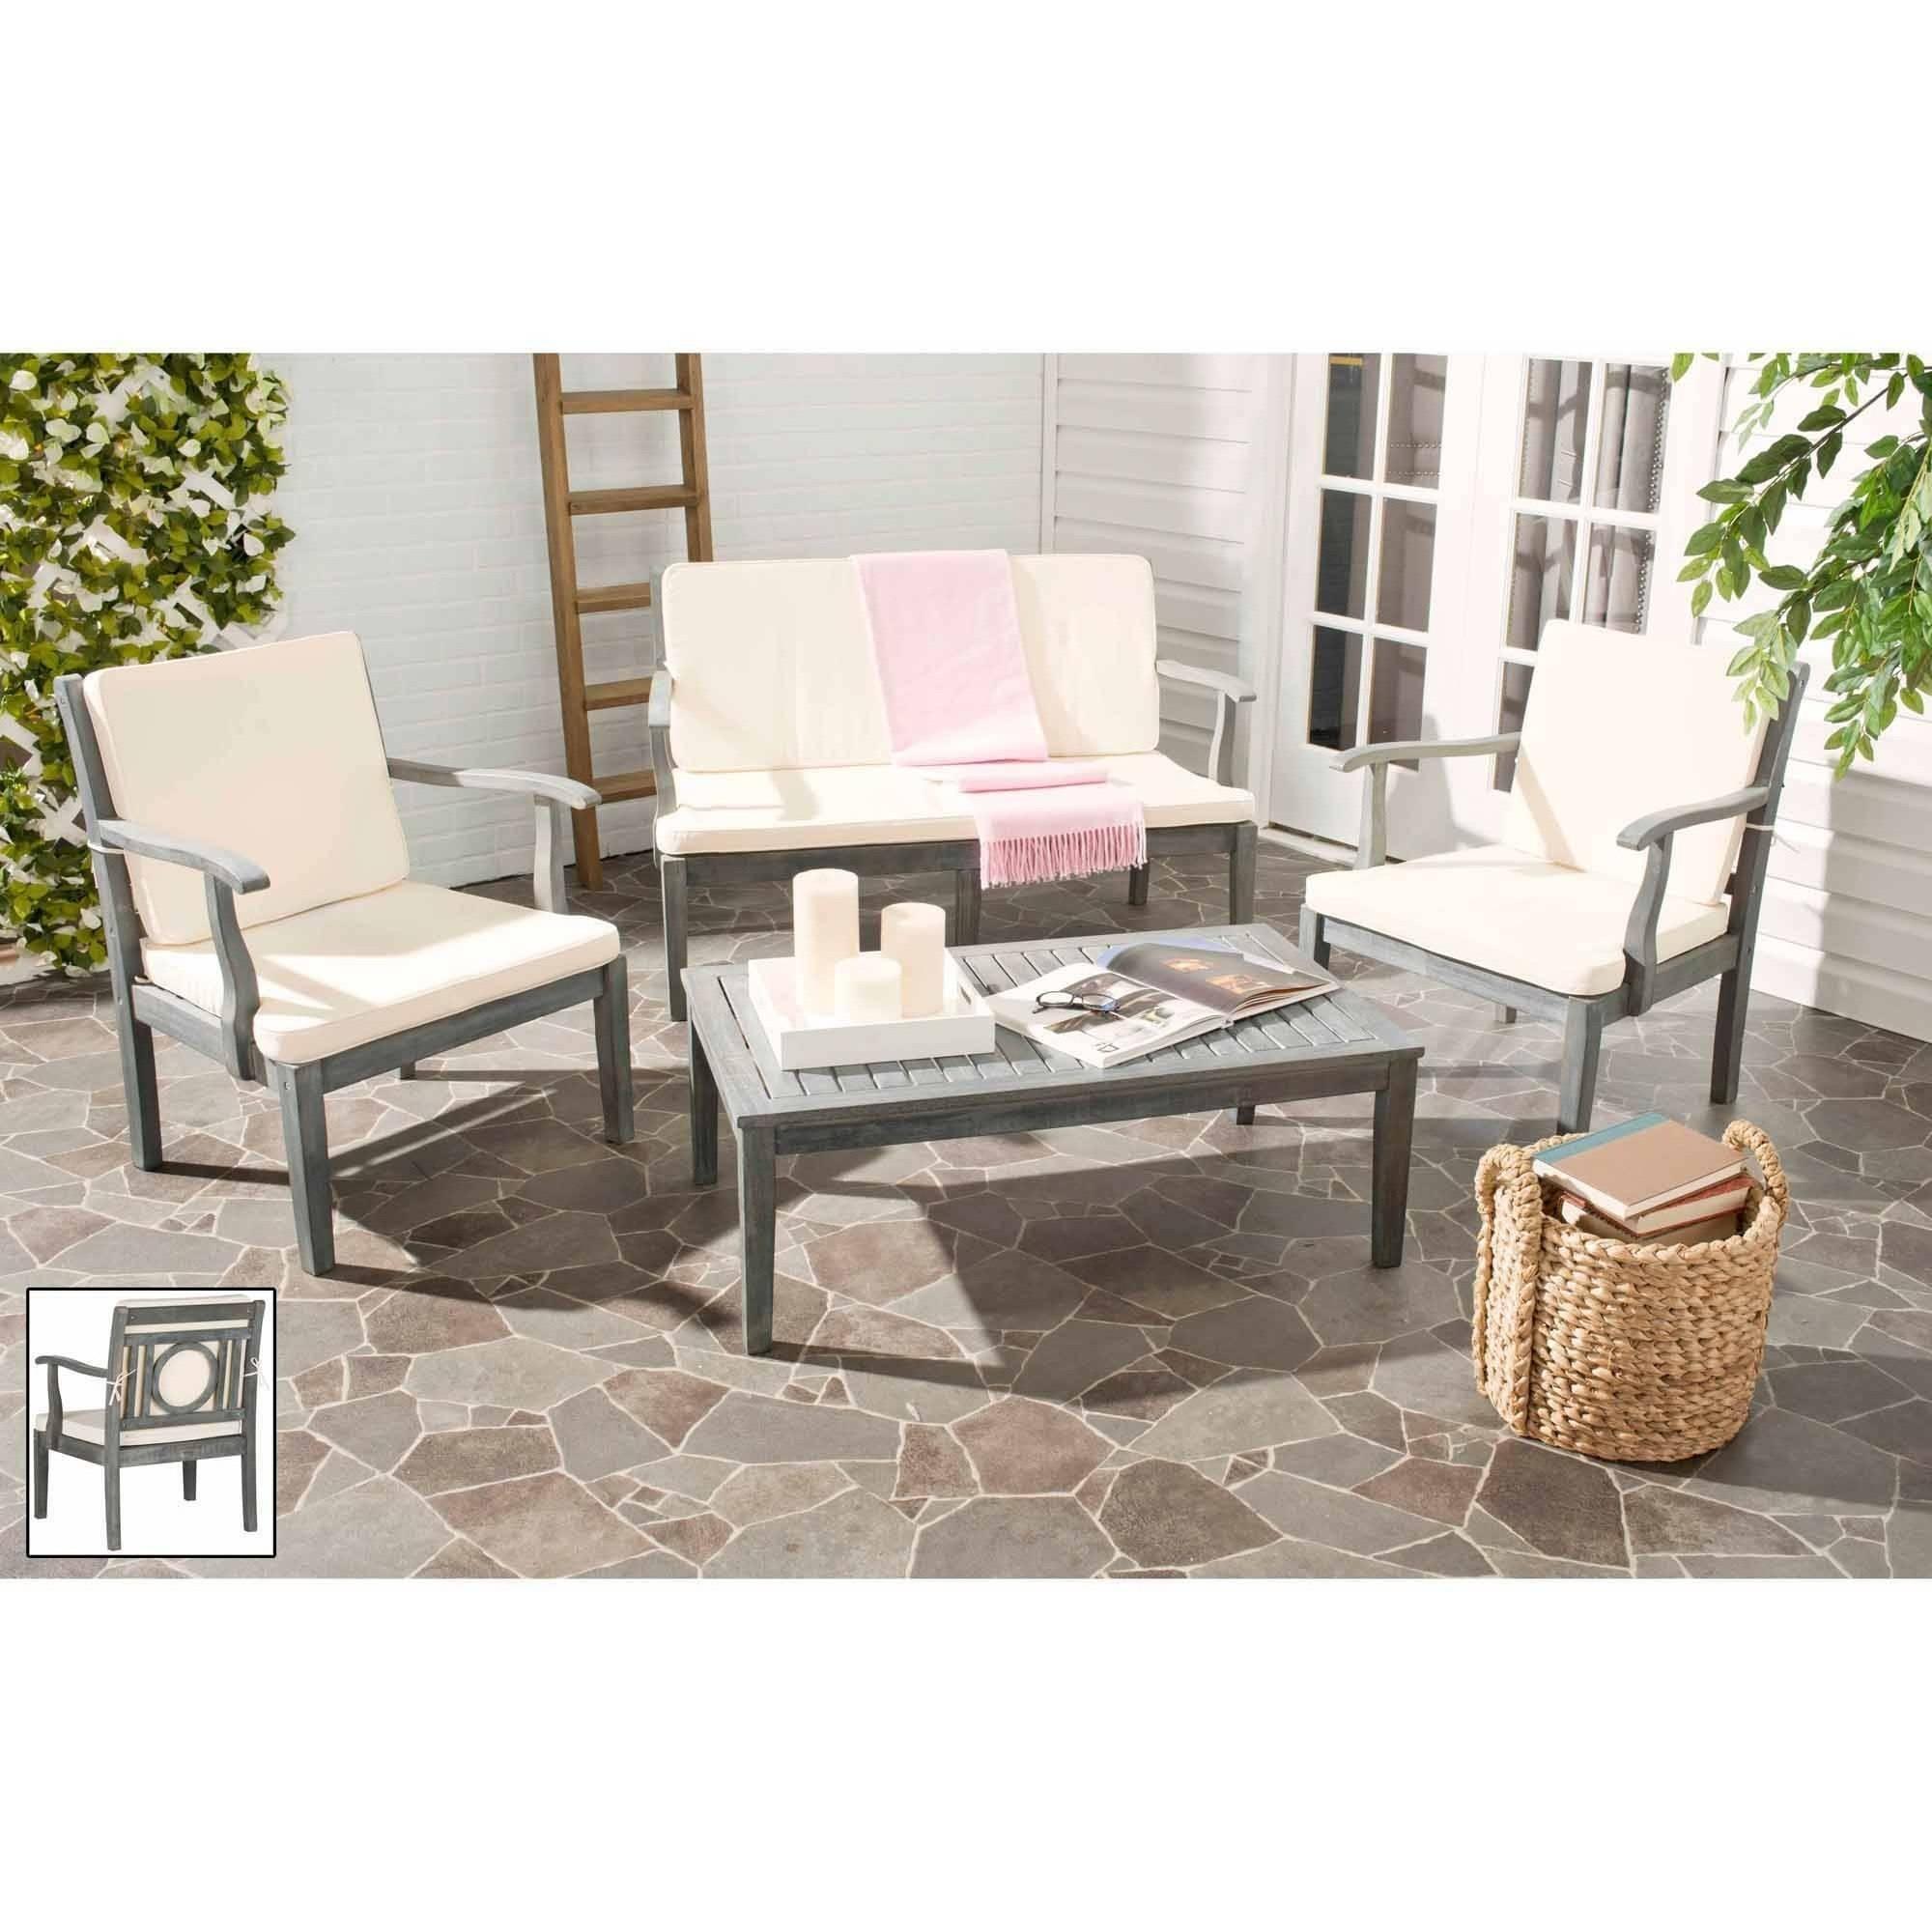 Safavieh Monclair 4-Piece Outdoor Living Set, Ash Grey